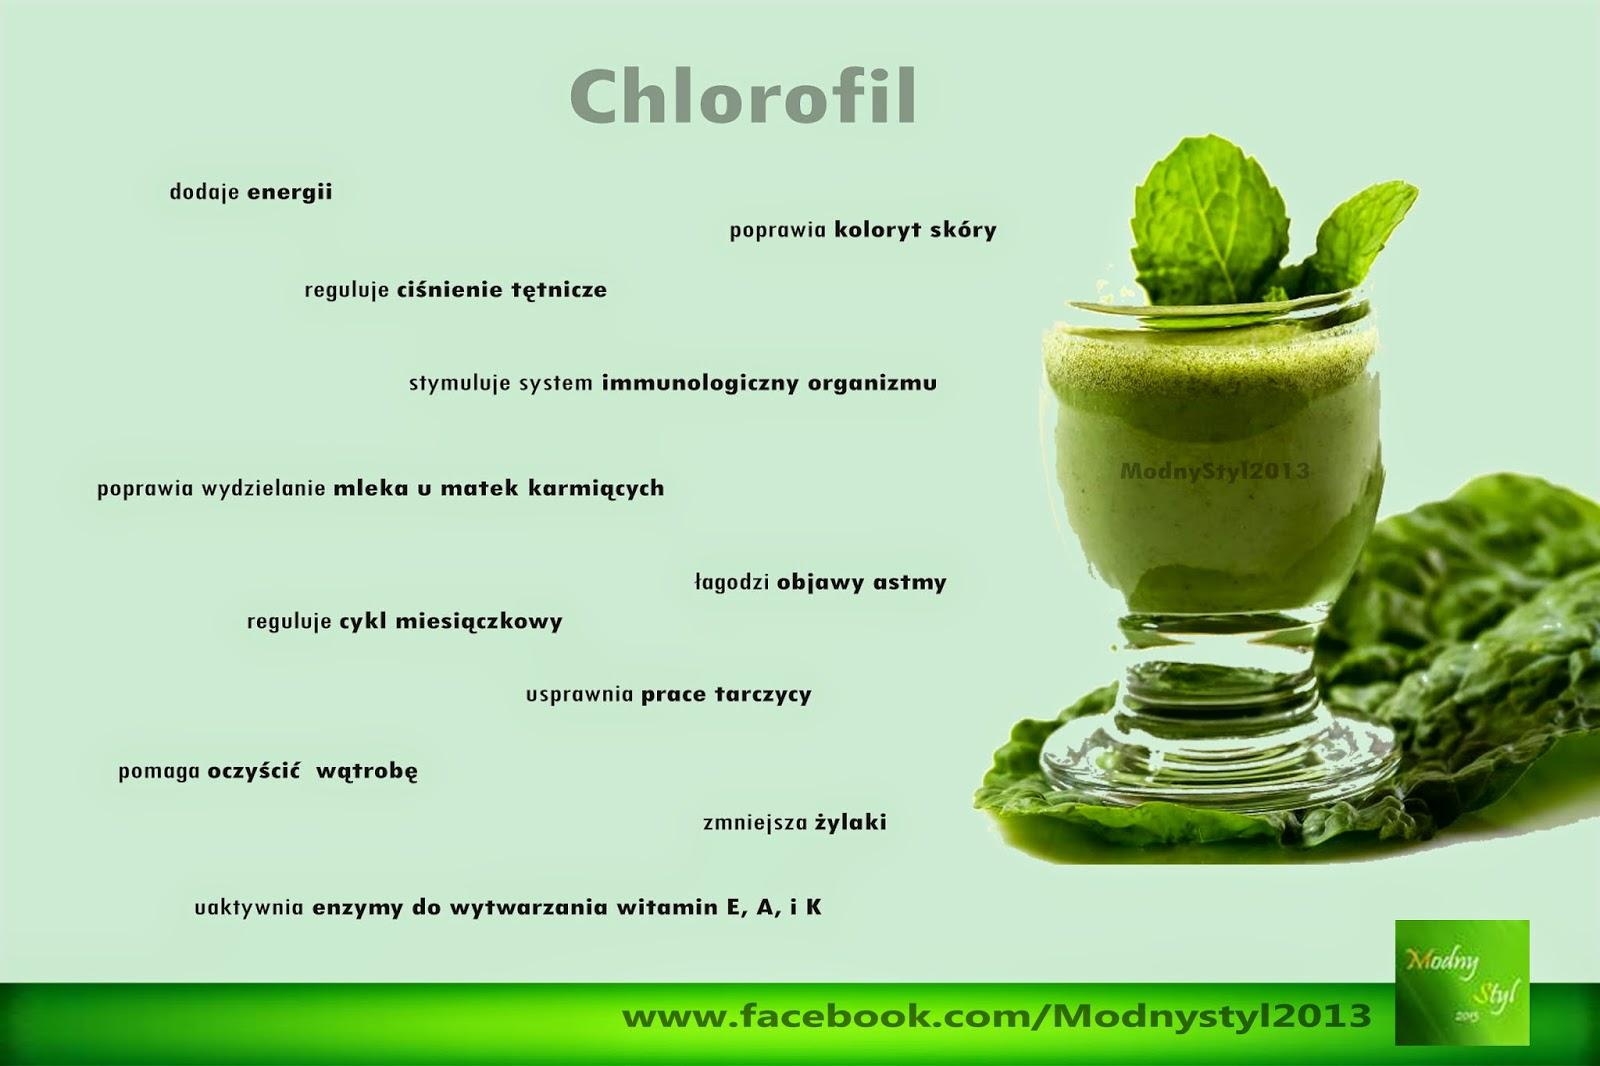 Chlorofil - eliksir młodości